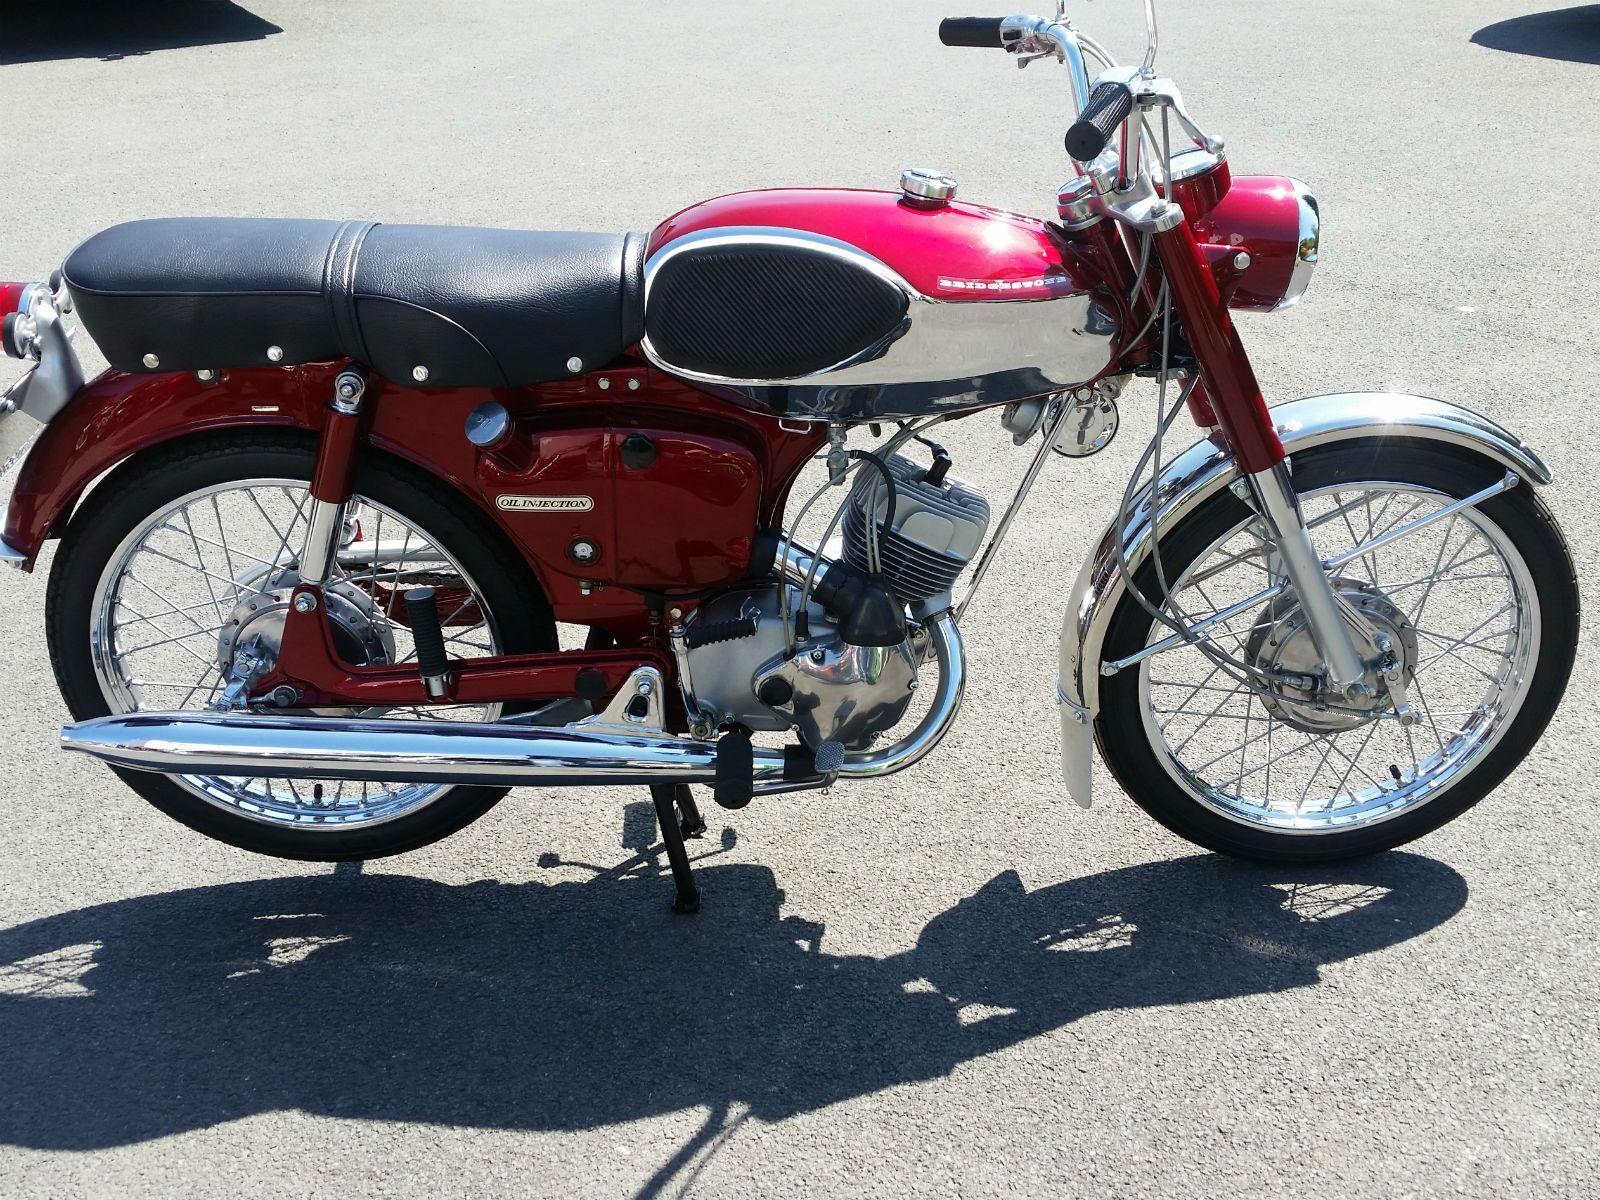 1966 Bridgestone Sport 90 Bridgestone Bike Motorcycle